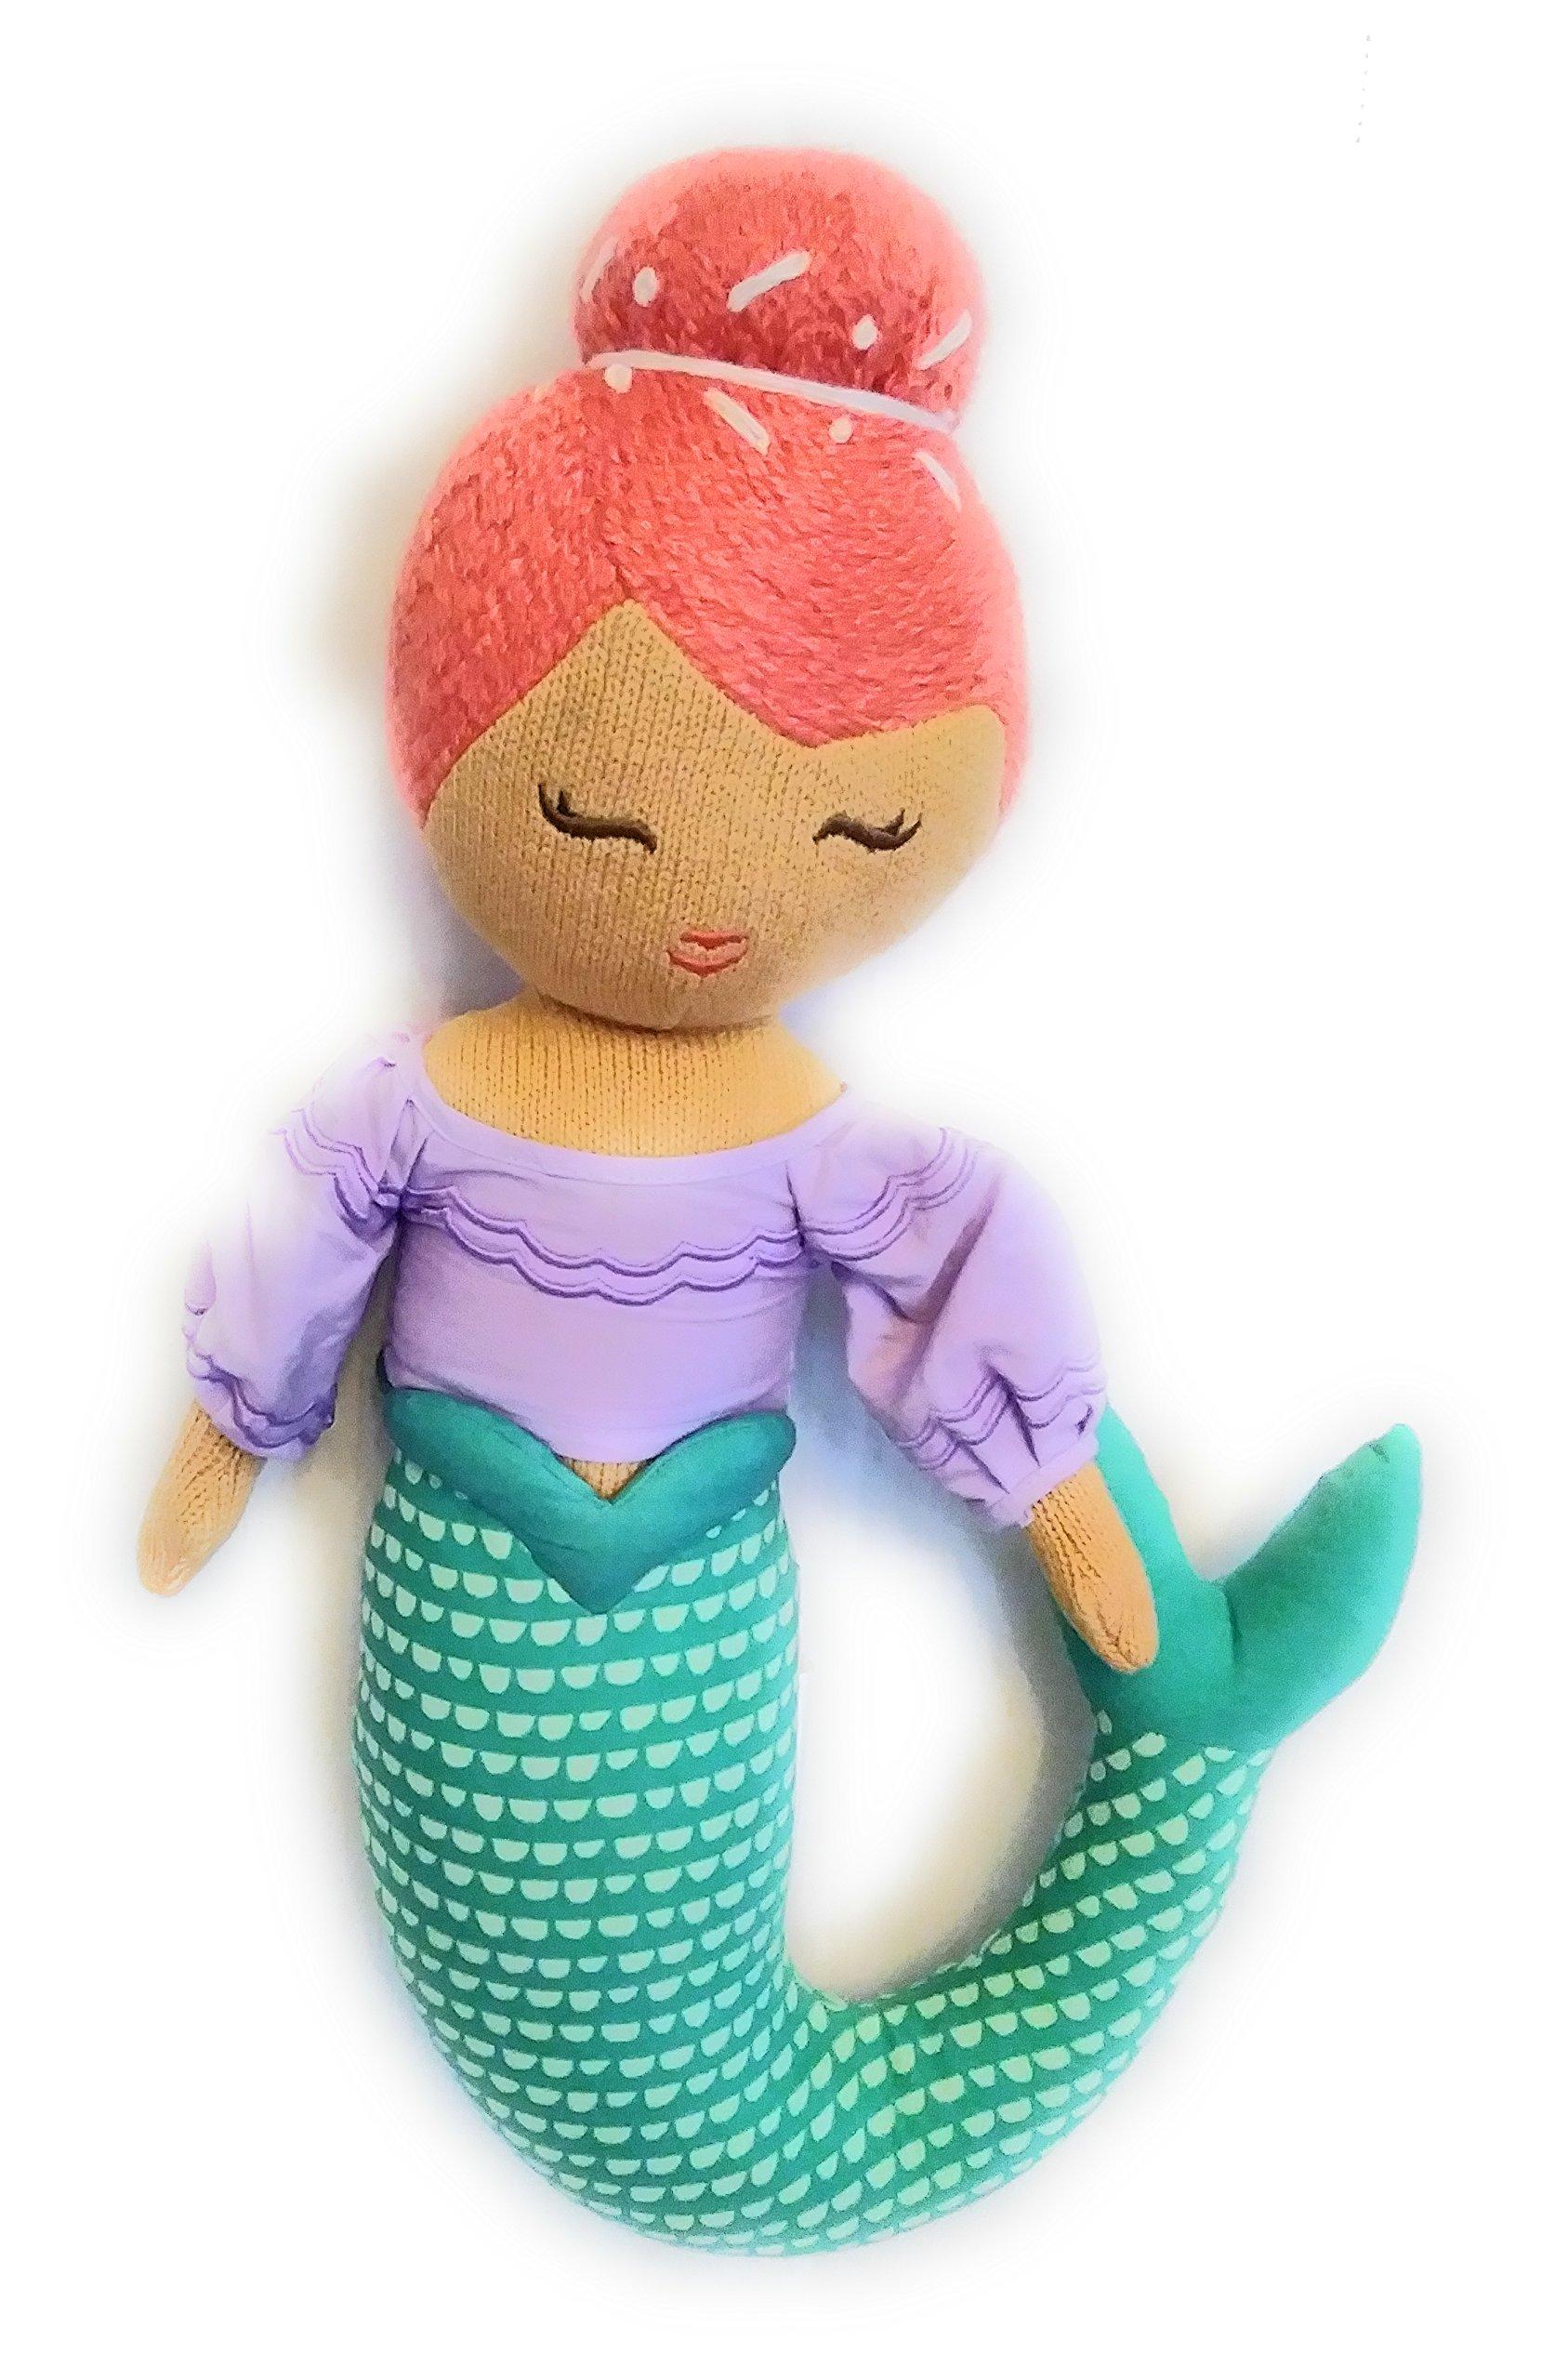 Pillowfort-Mermaid-Throw-Pillow-Doll